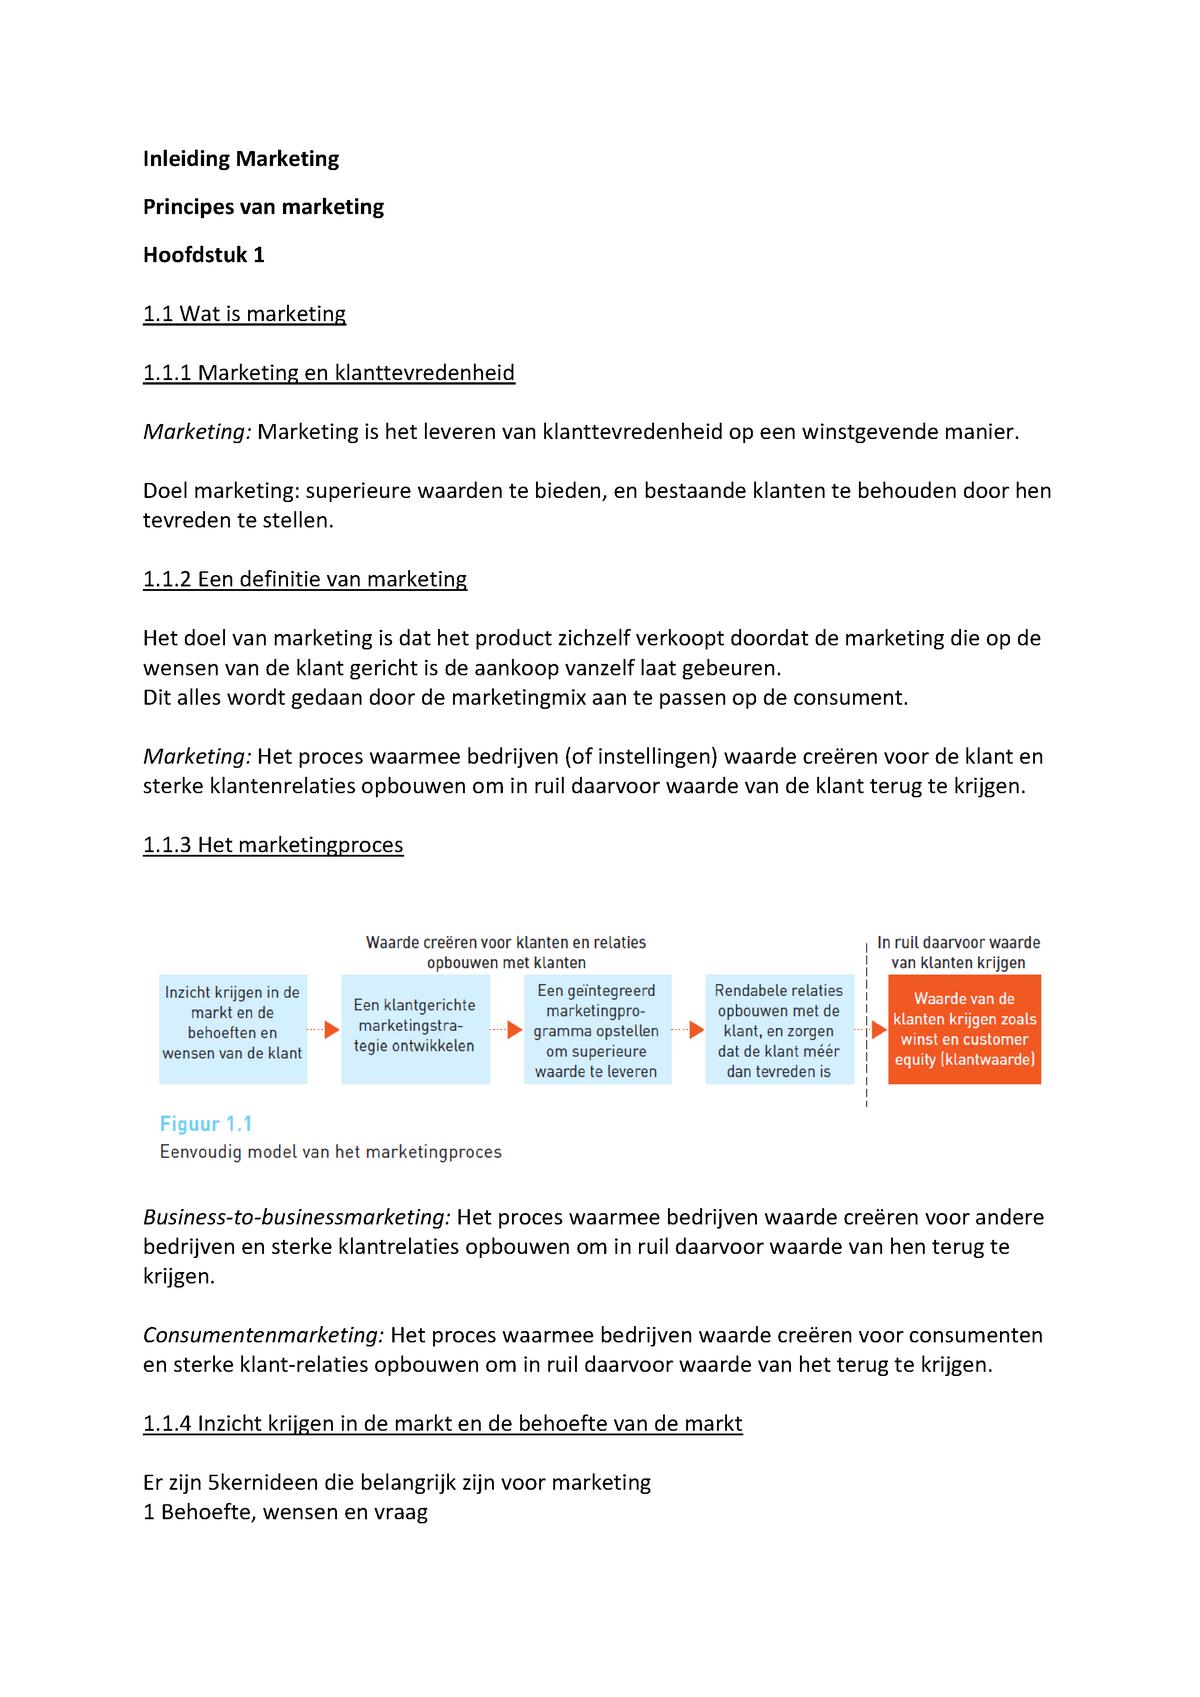 20c619c9ecb Samenvatting Principes van Marketing Kotler - CE1.2IM - StudeerSnel.nl